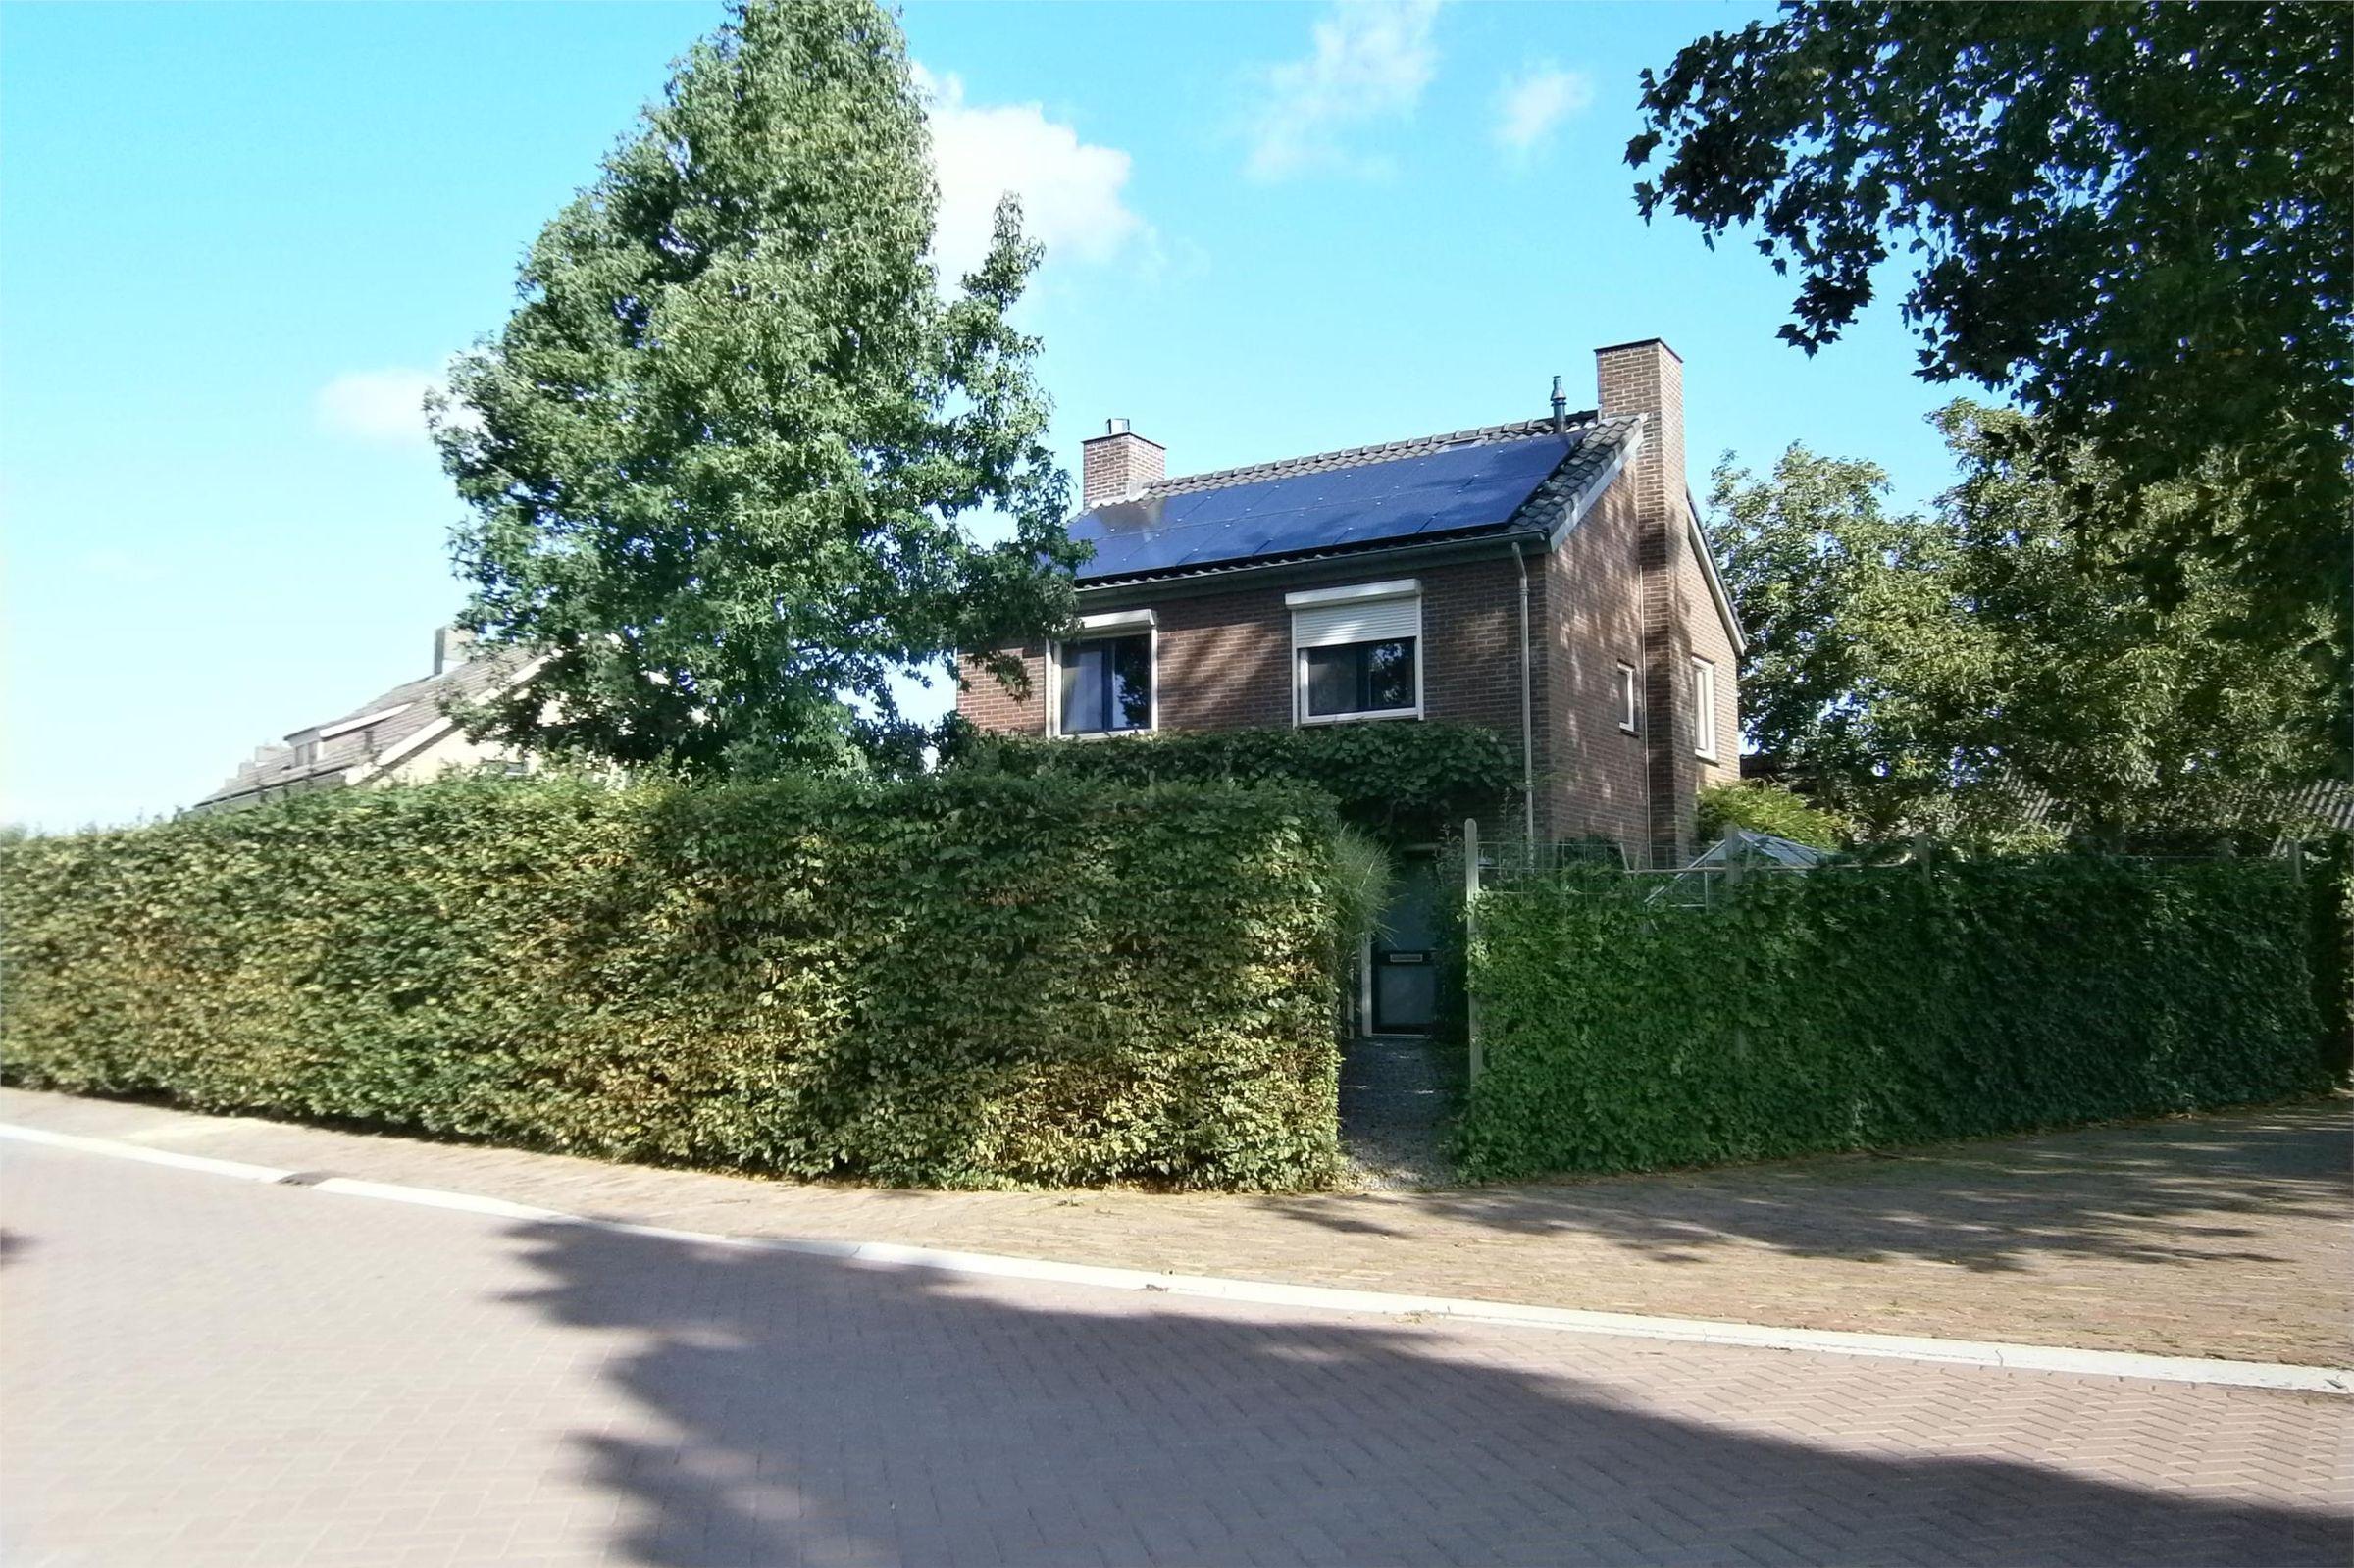 Kerkstraat-noord 34, Oeffelt